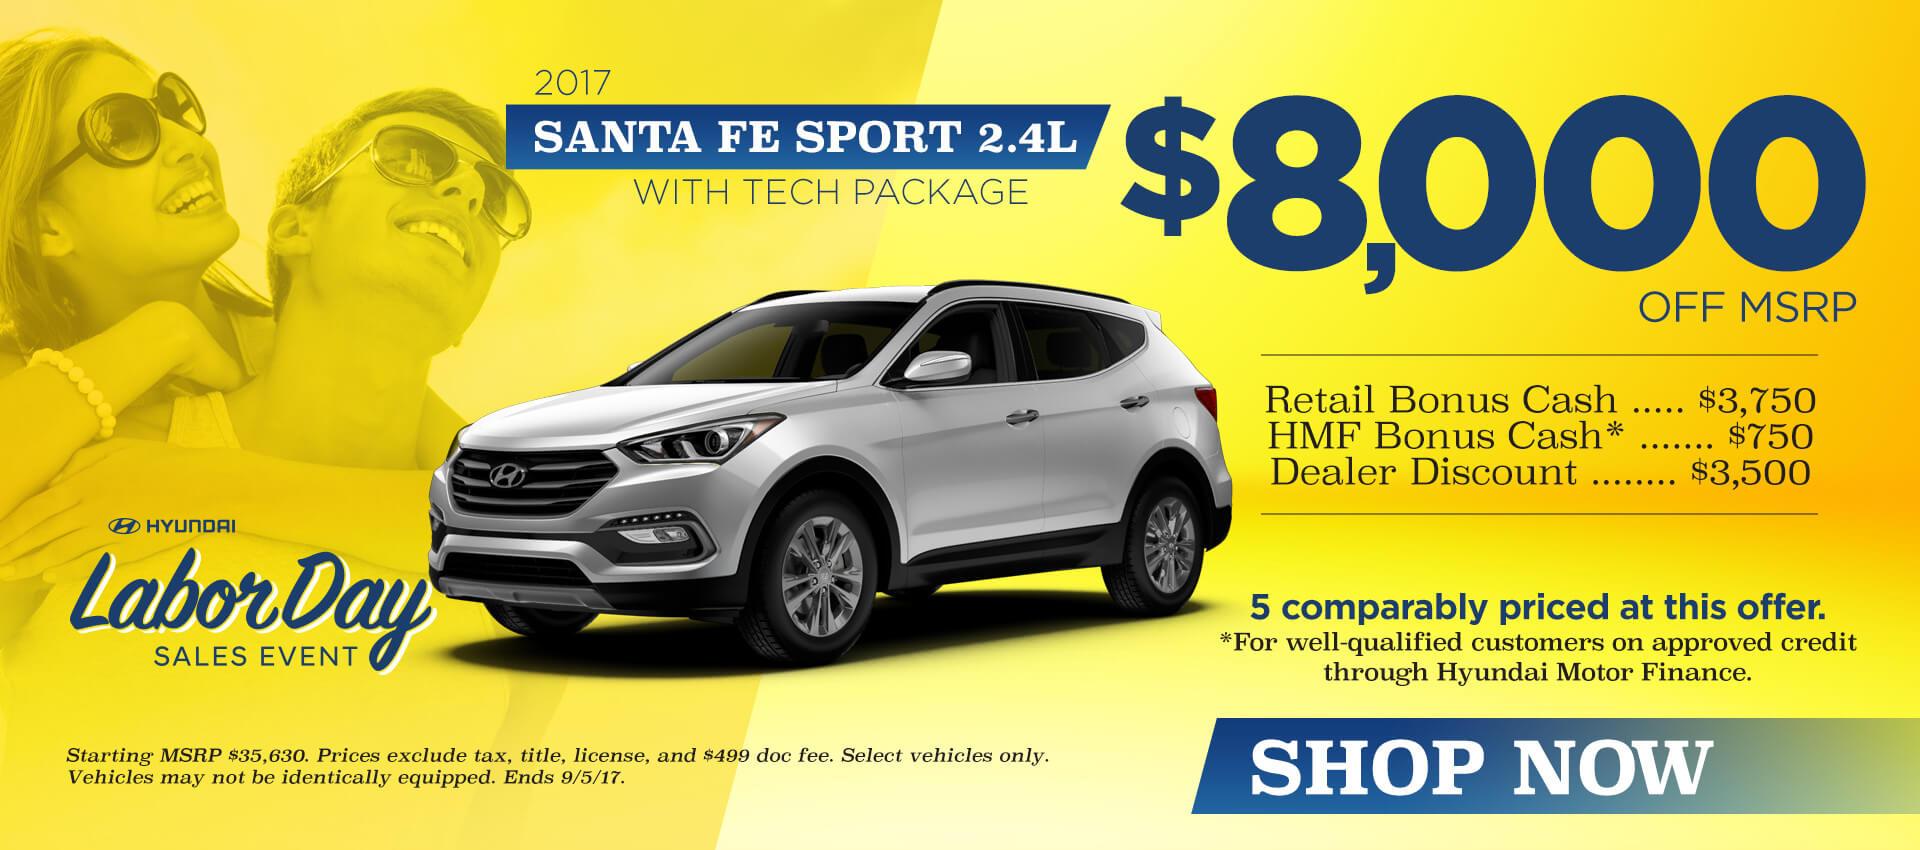 Santa Fe Sport